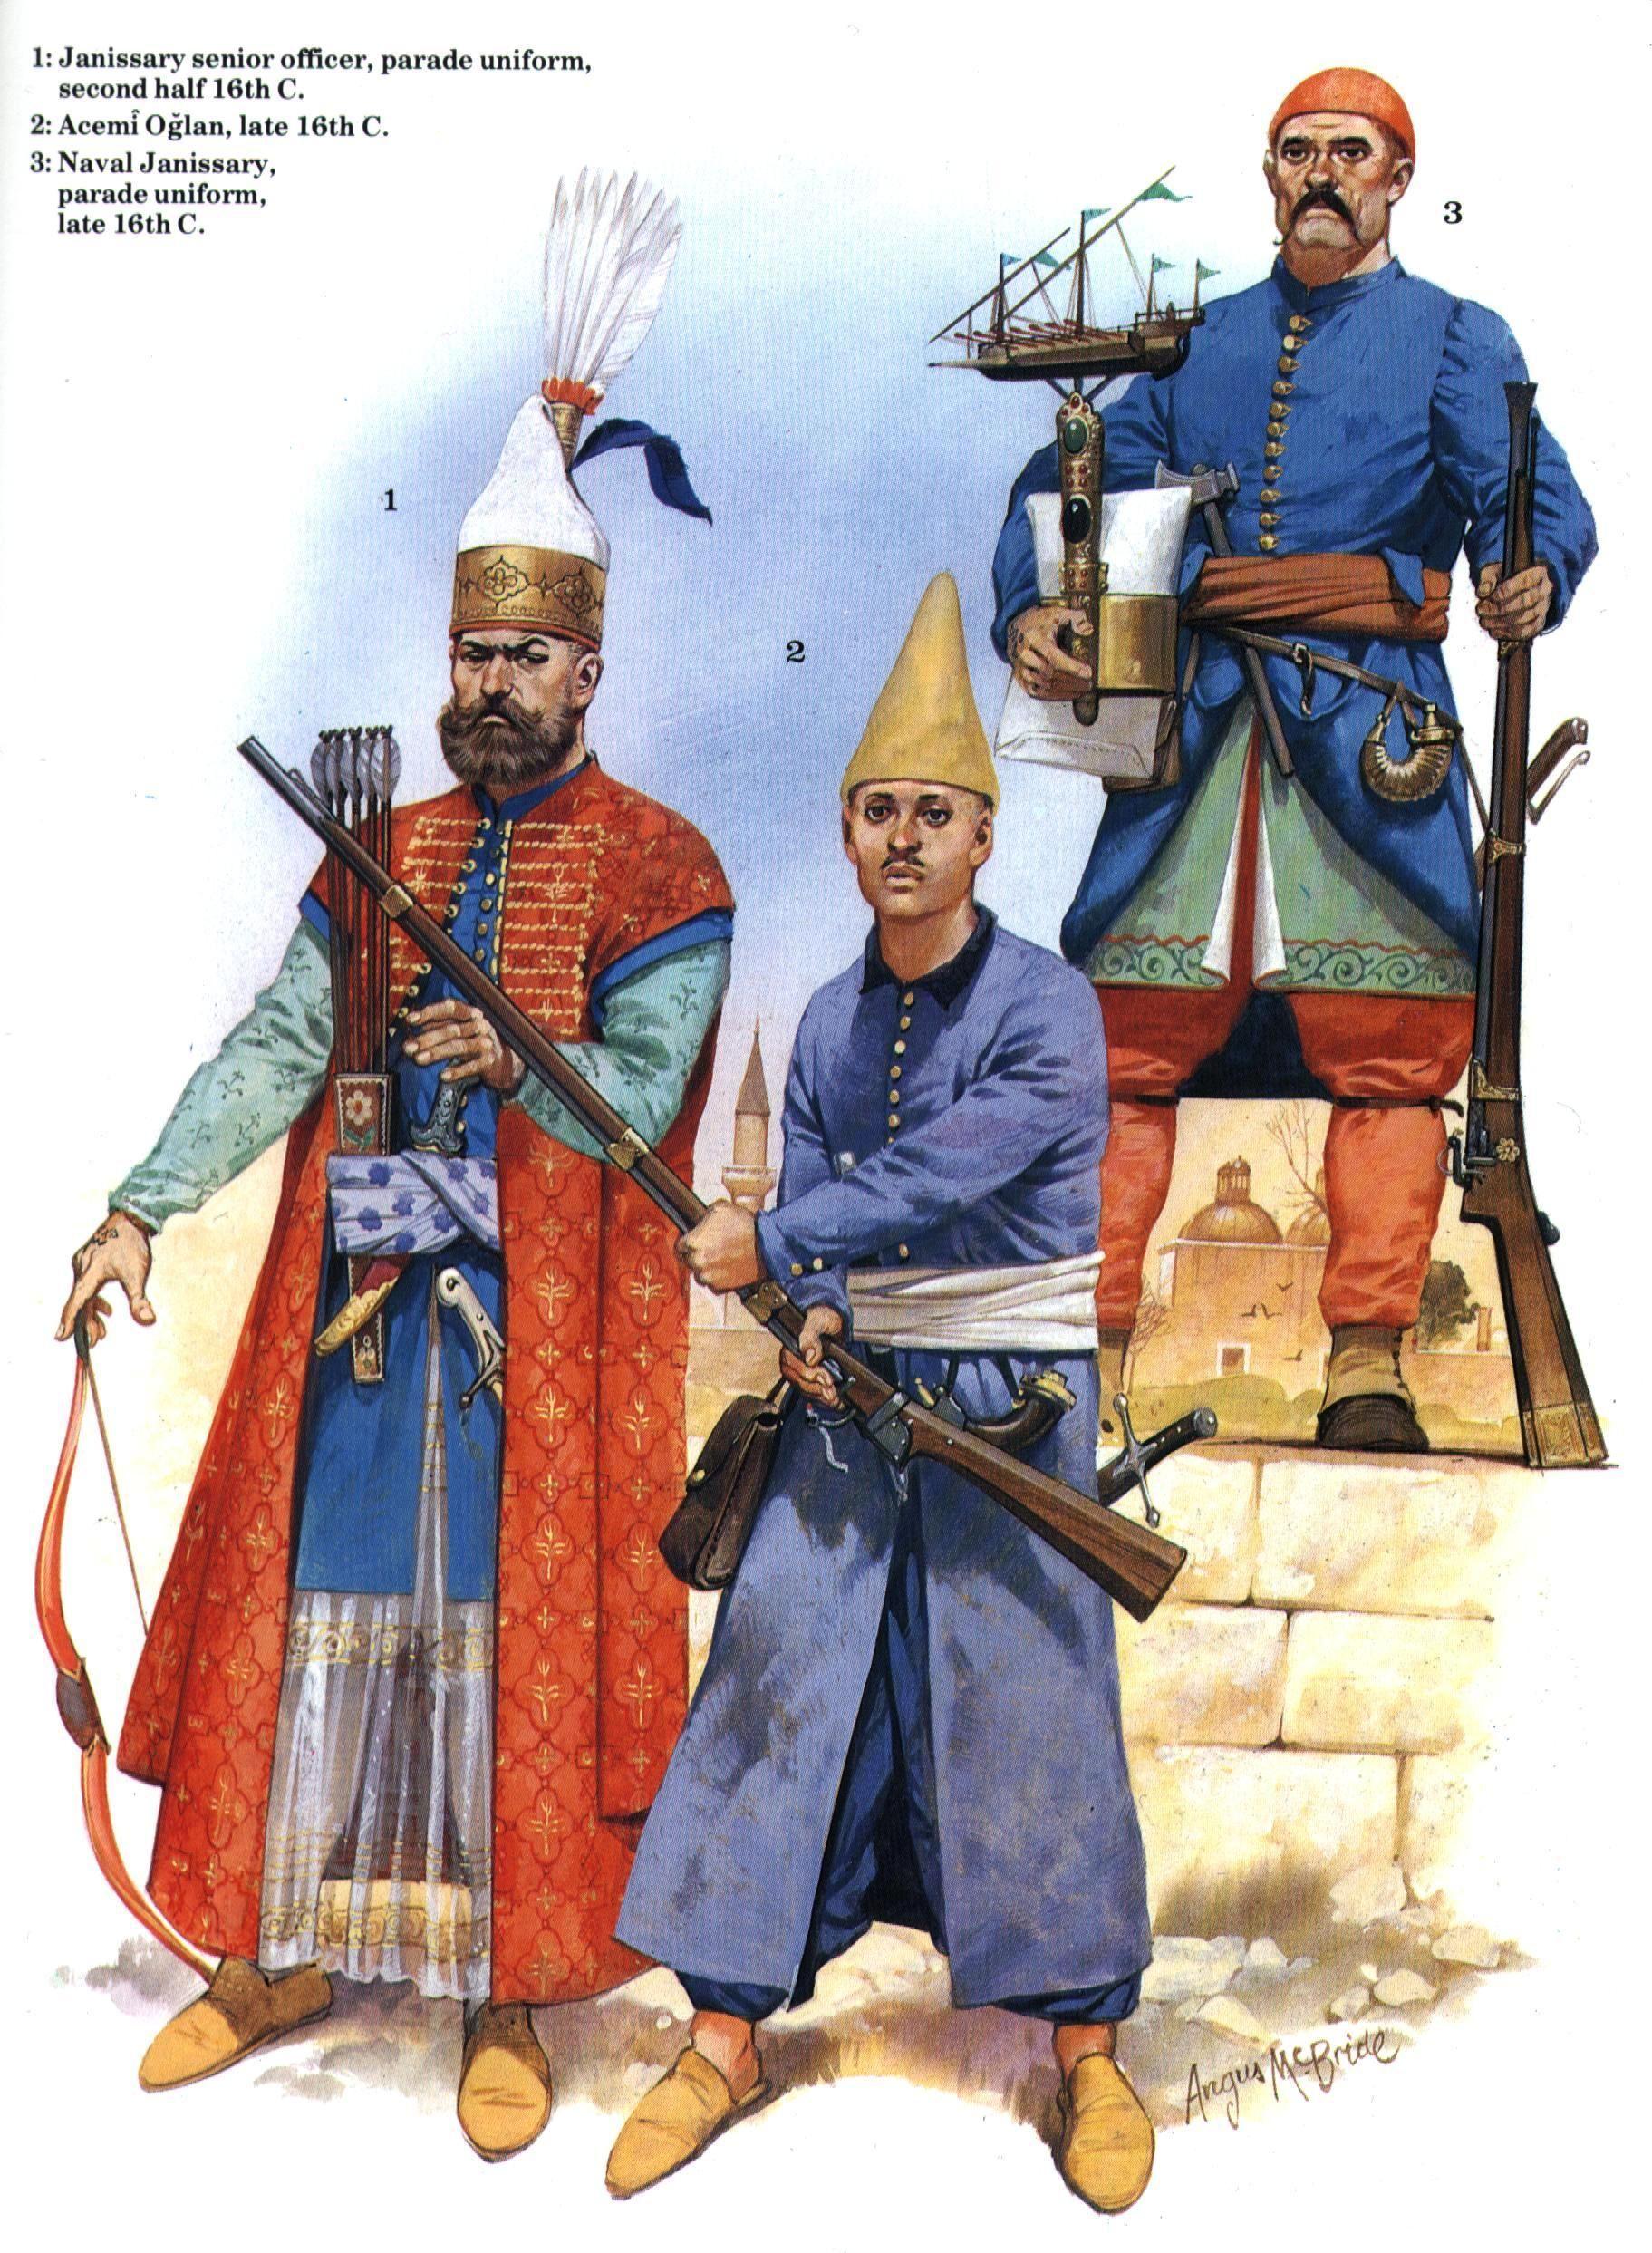 14th century ottoman soldiers - Google Search | Janissaries, Ottoman  empire, Ottoman turks